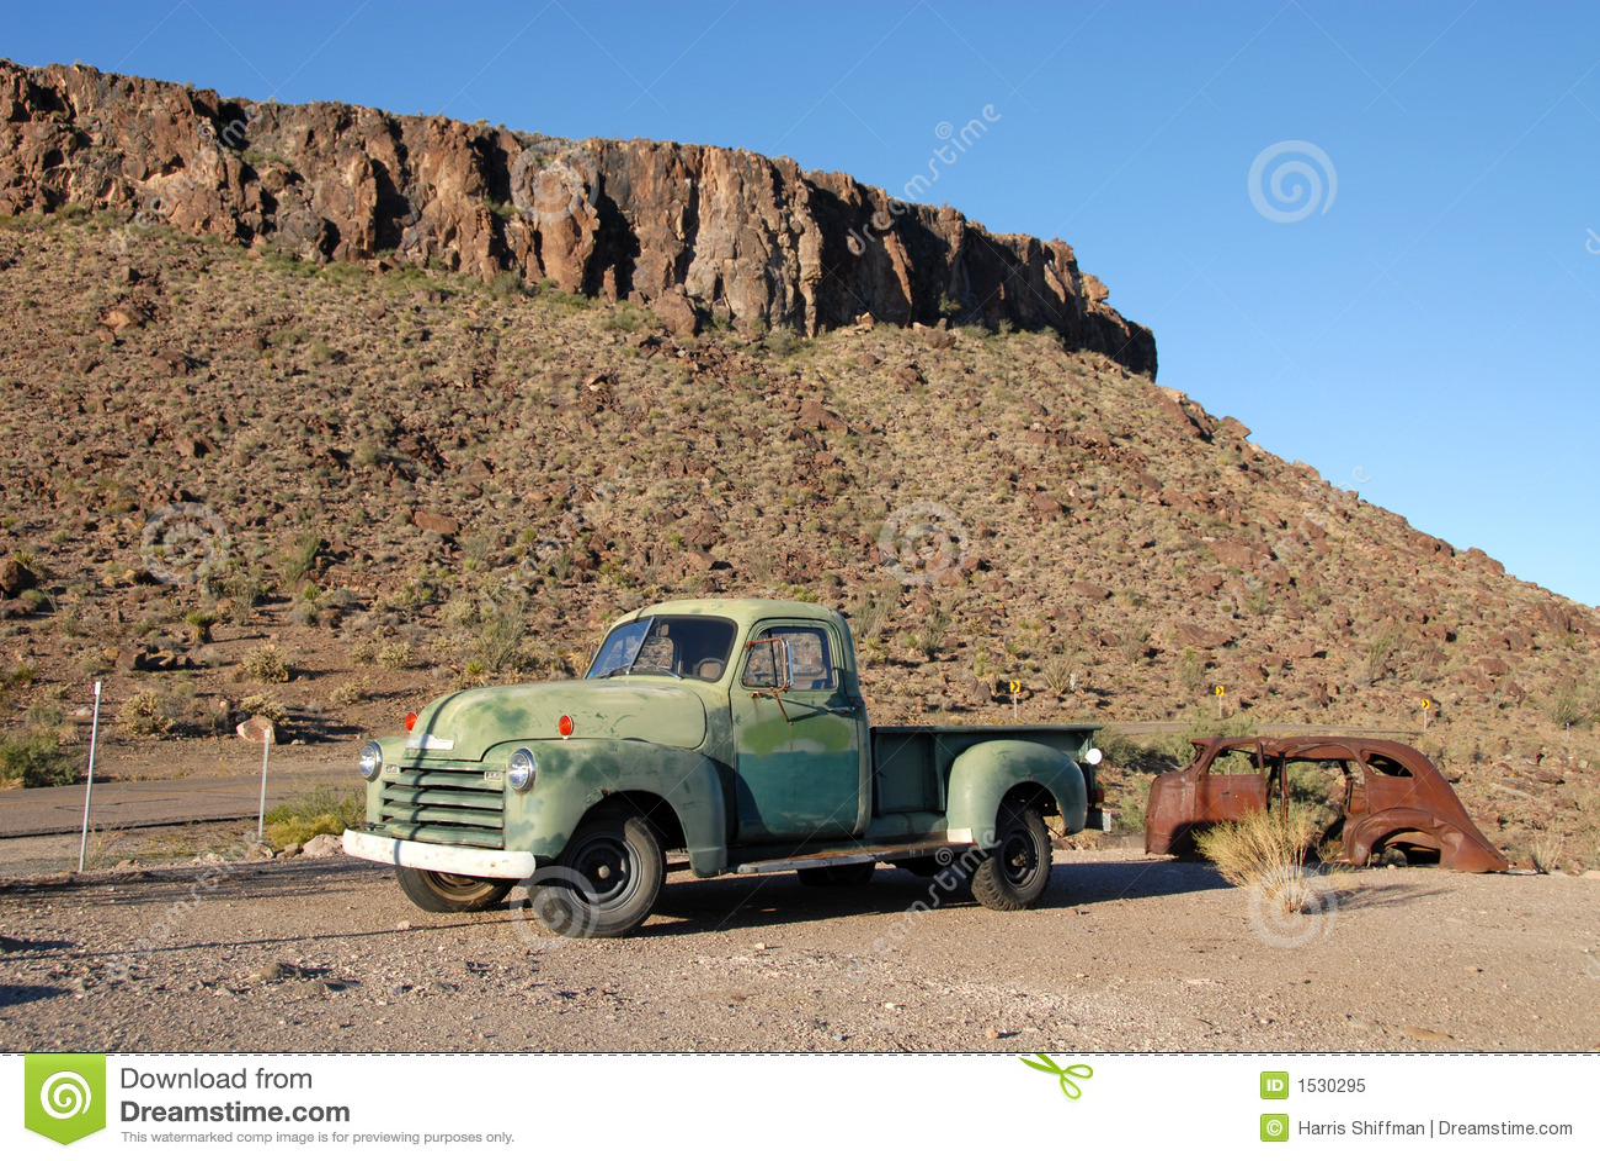 Stara ciężarówka.